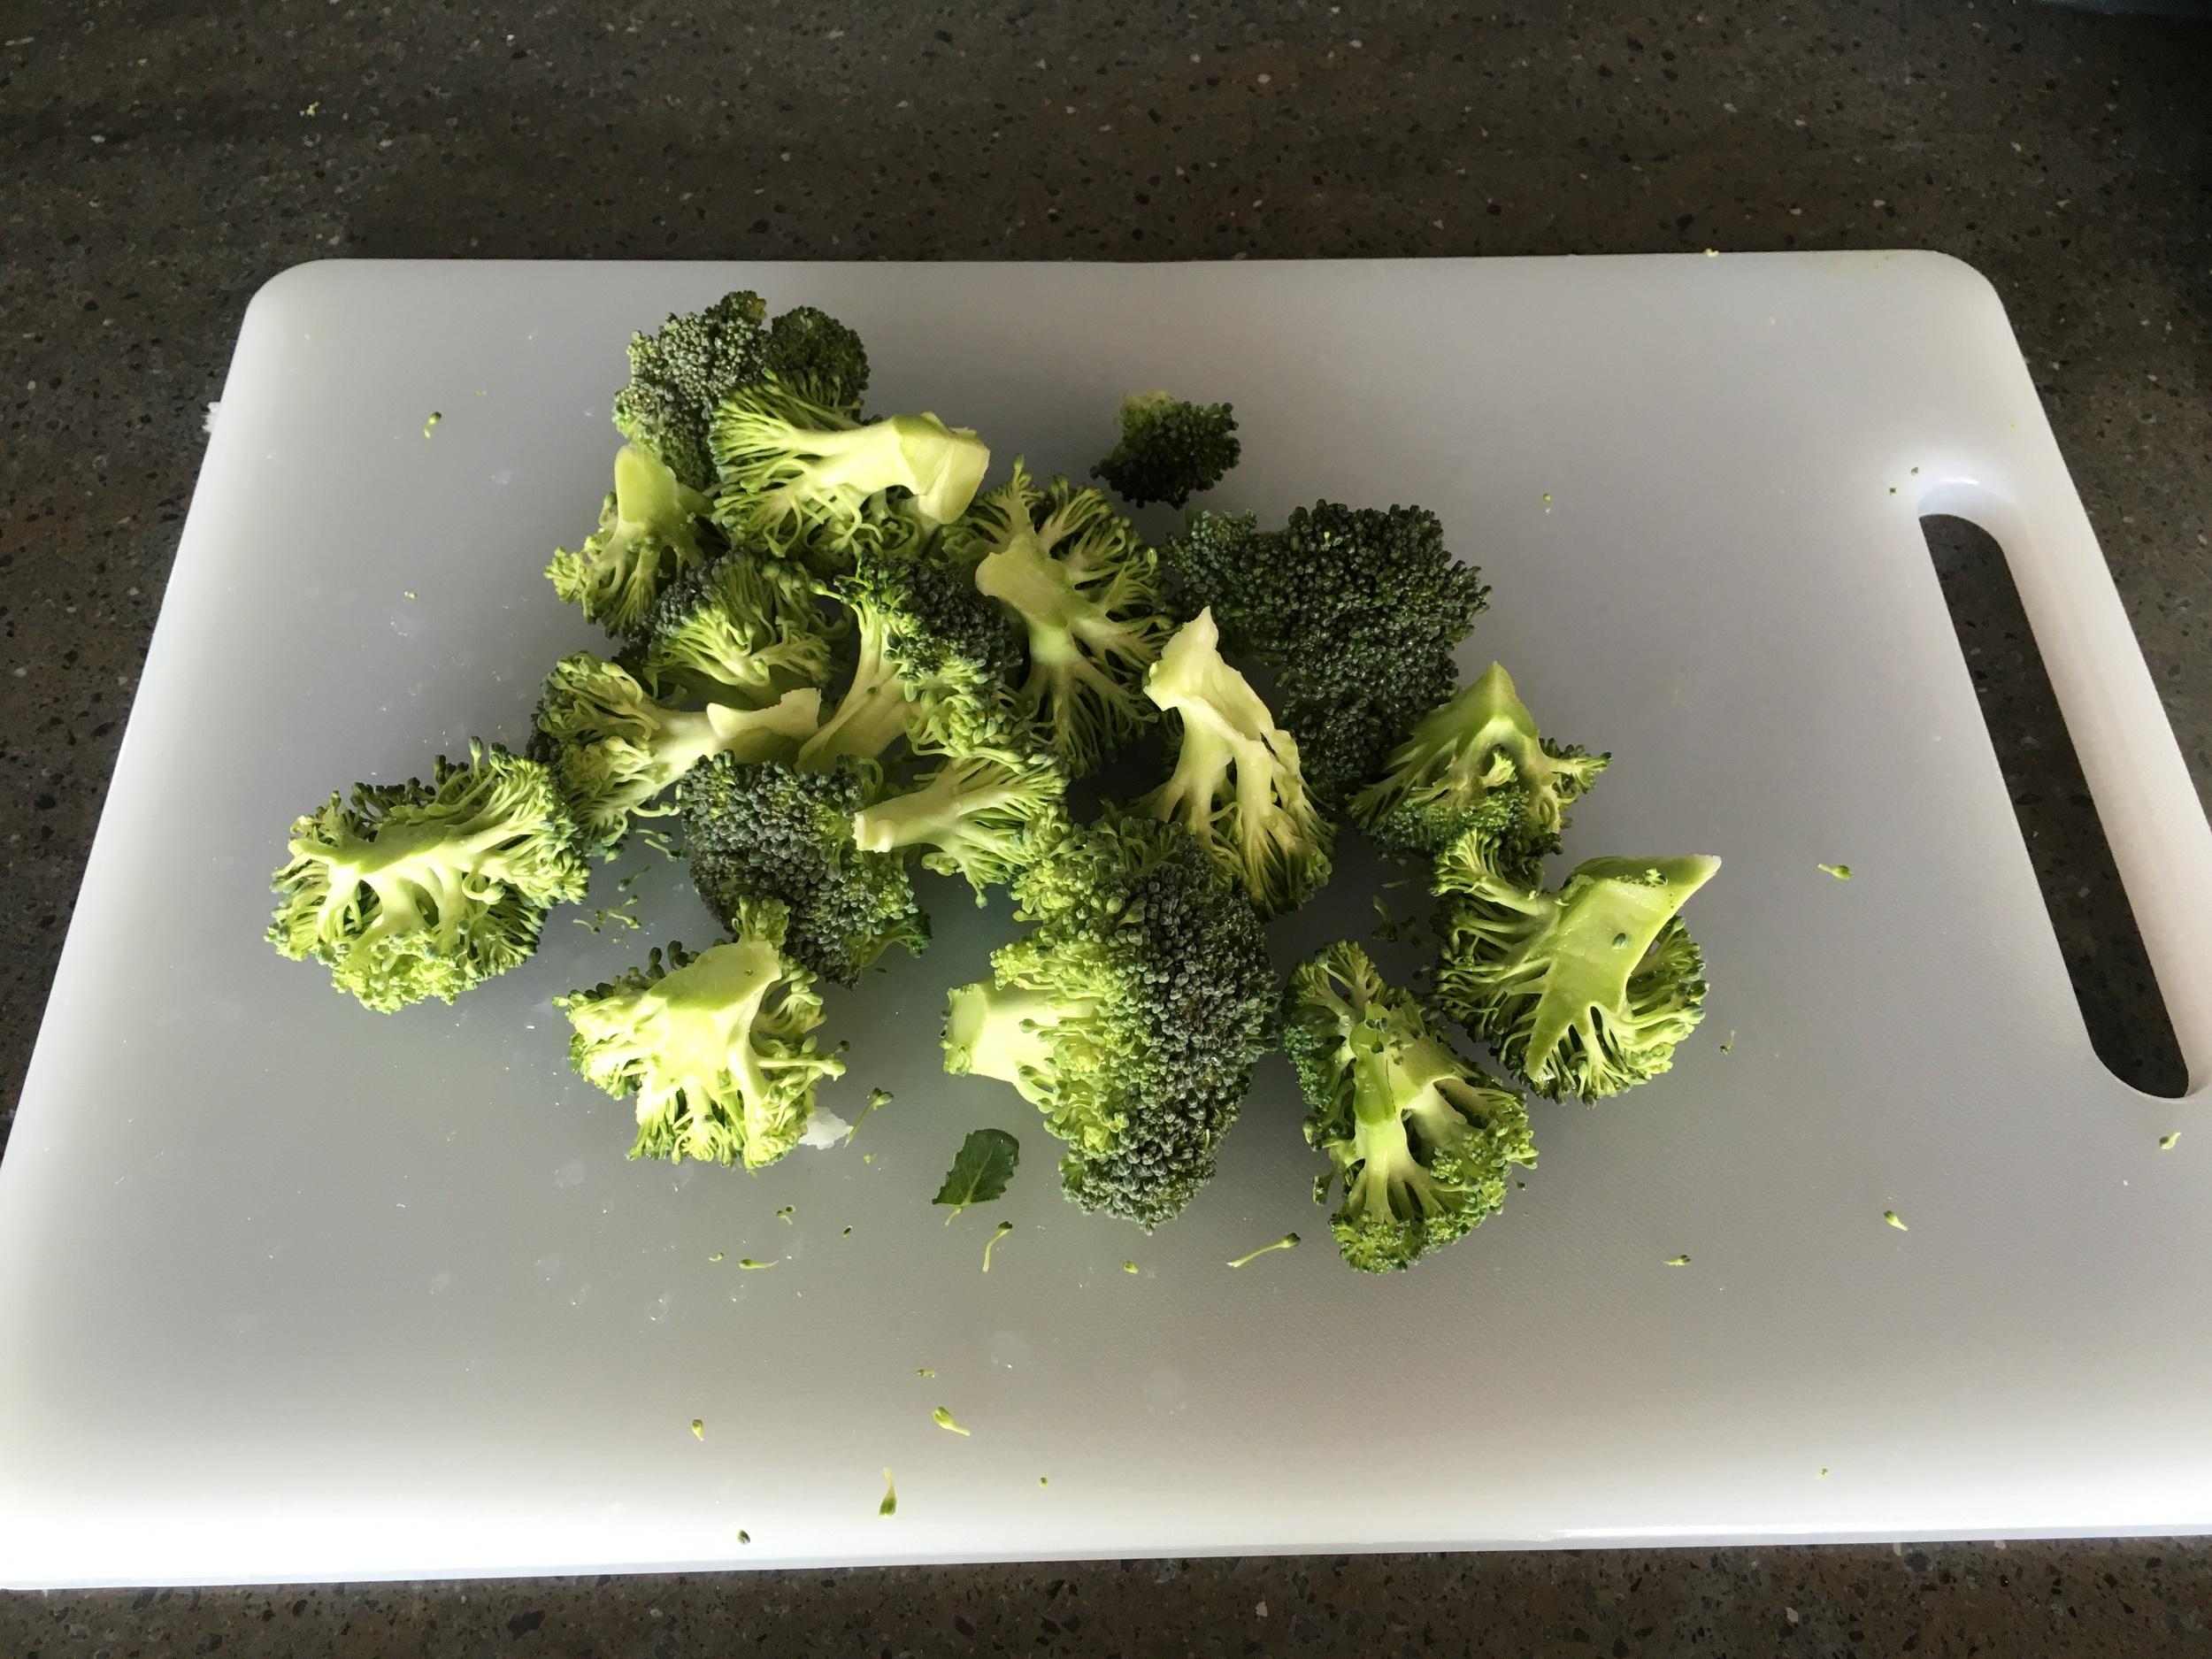 Step 2: Chop broccoli into florets